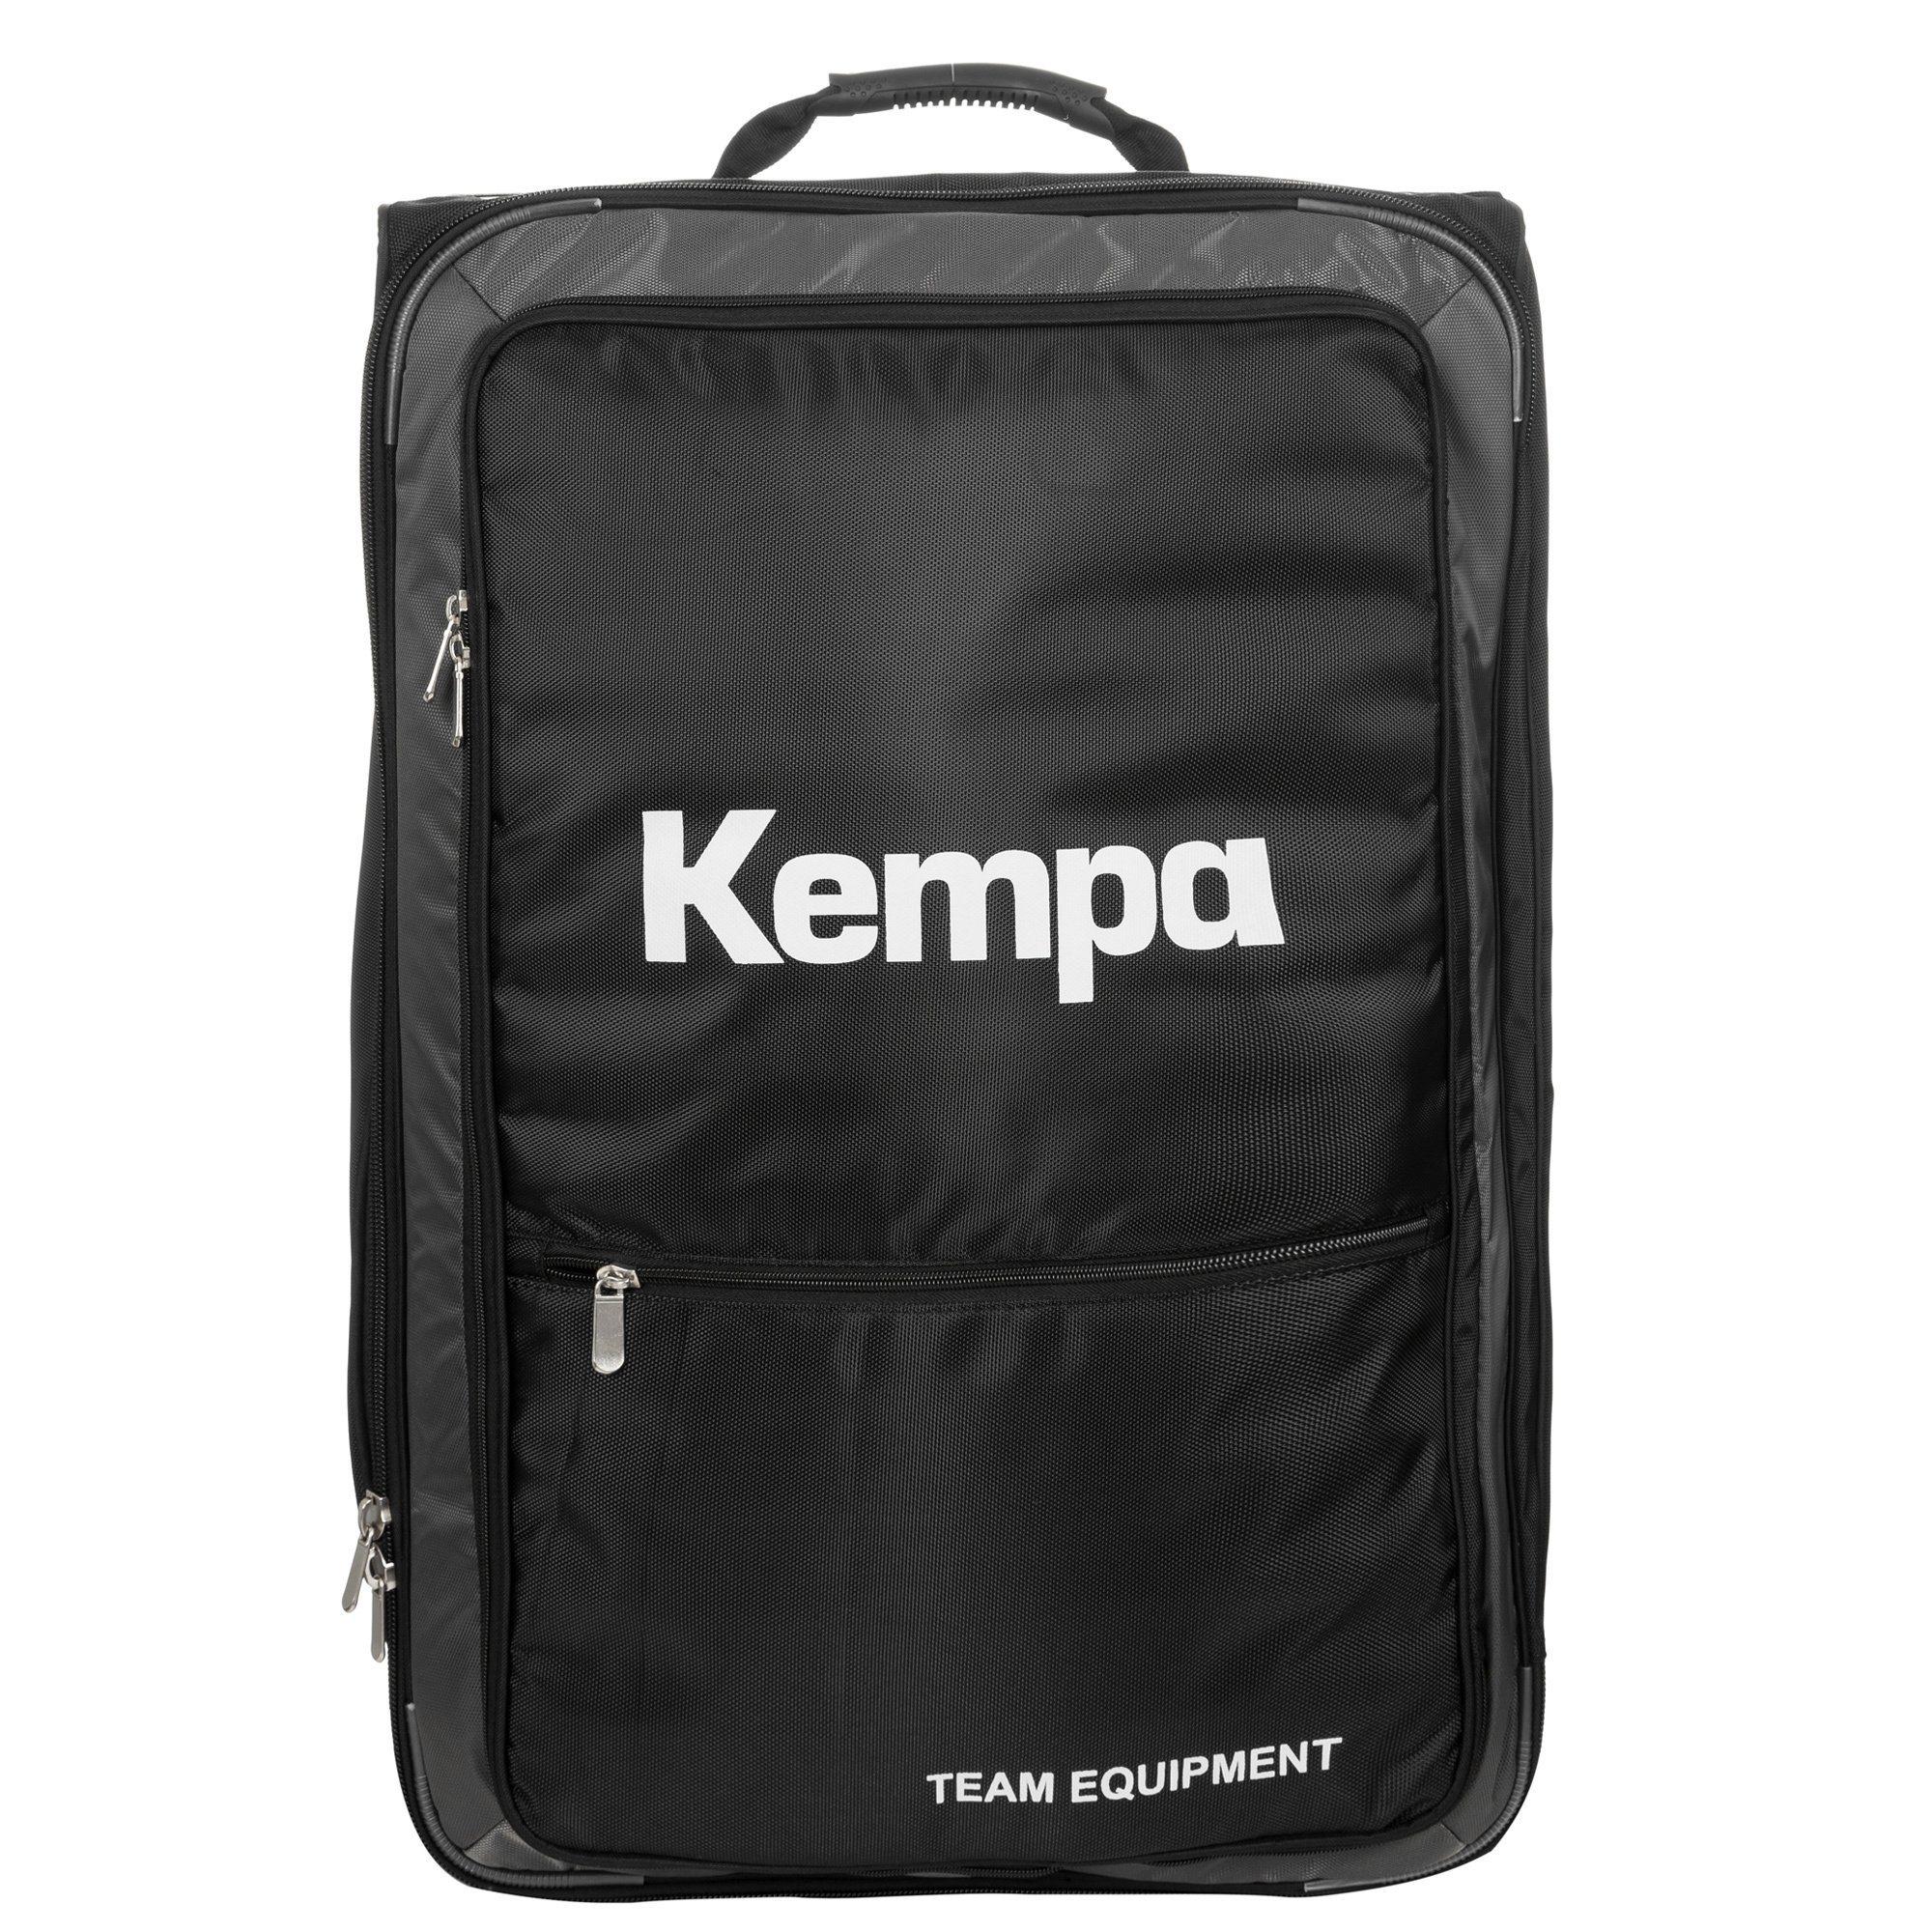 Kempa TEAM EQUIPMENT TROLLEY | Taschen > Koffer & Trolleys > Trolleys | Schwarz | Kempa